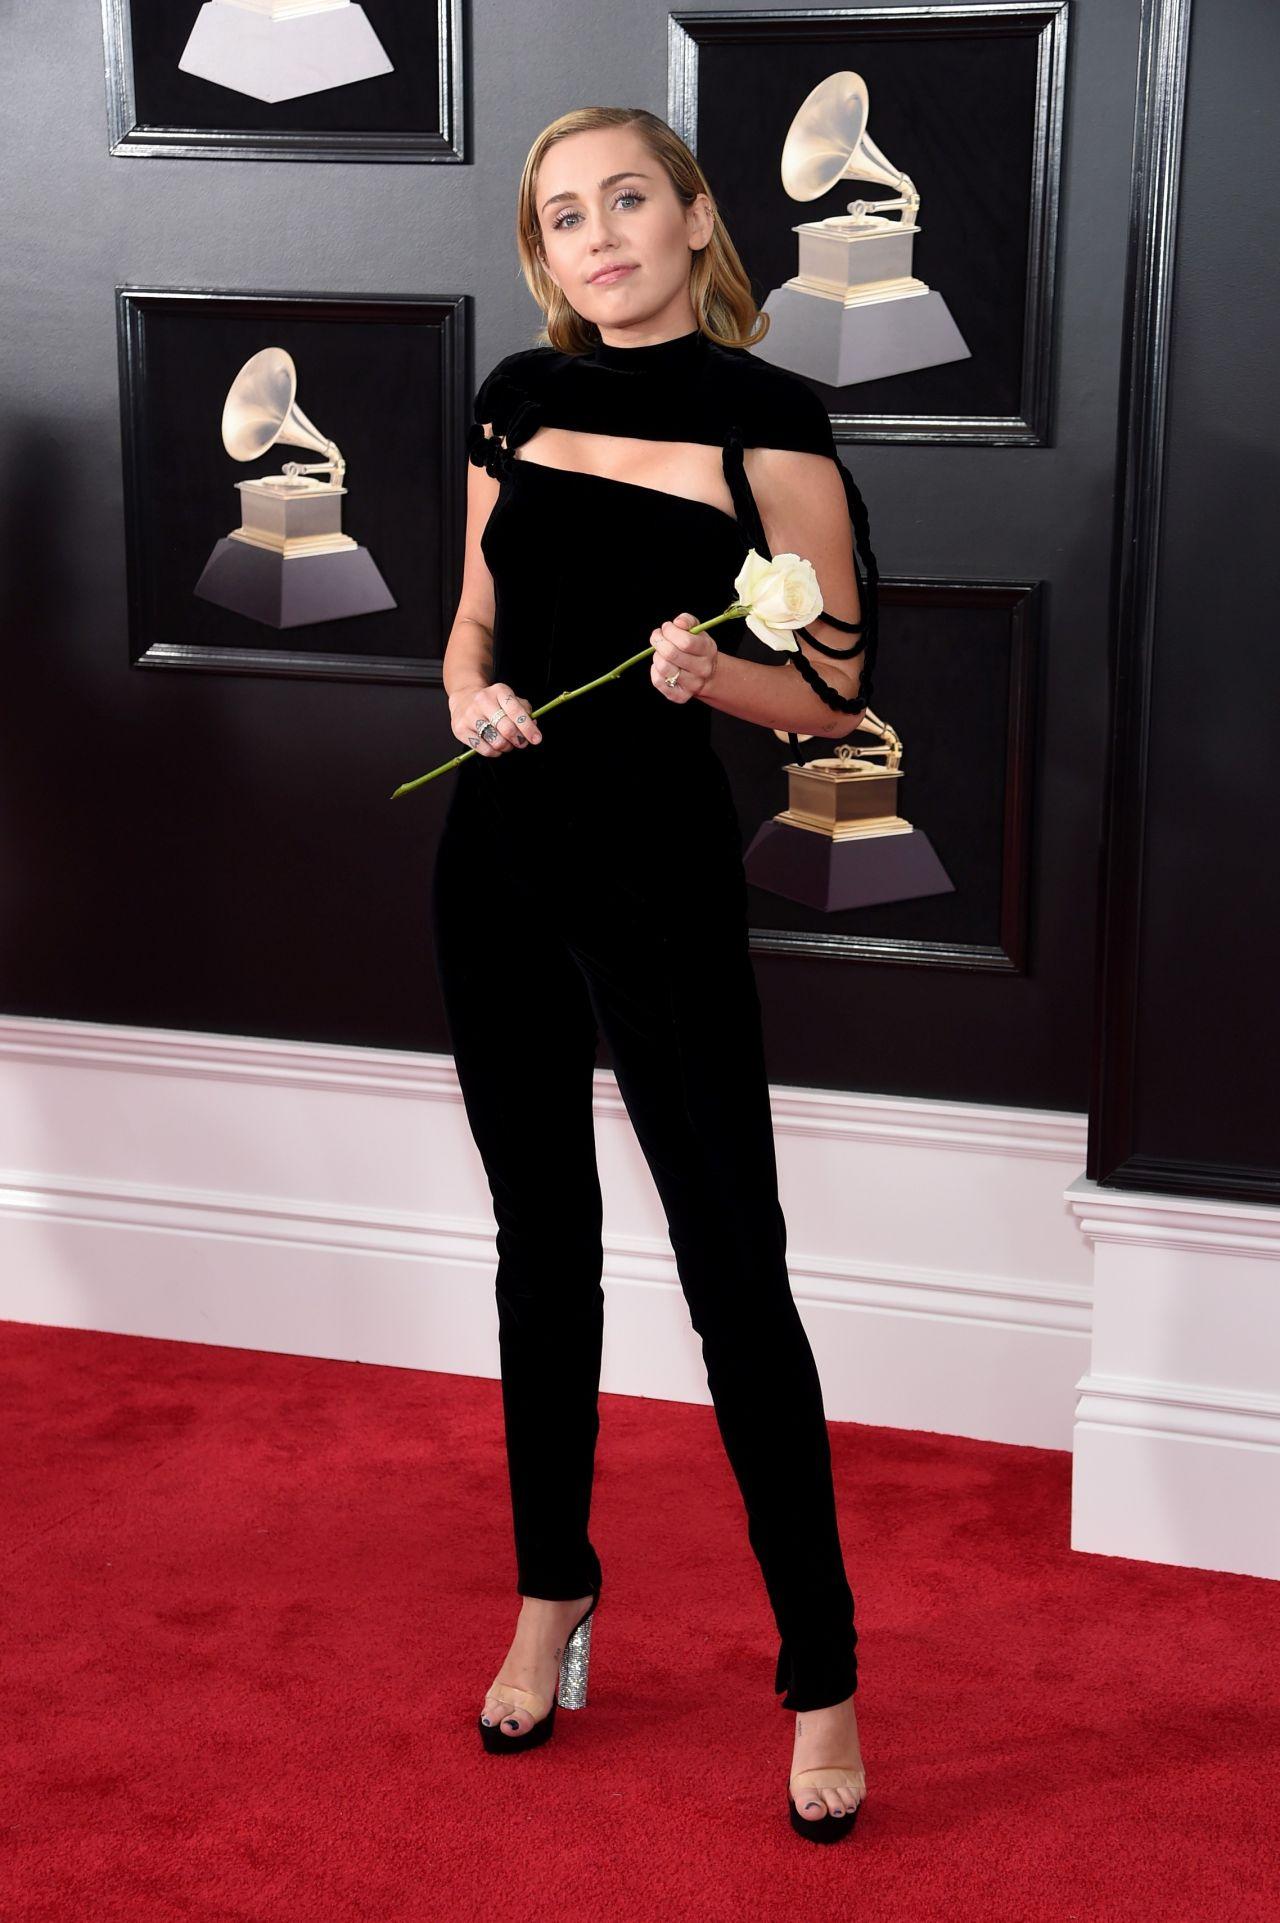 Miley Cyrus Leaked (29 Photos) - Celebrity Nude Photos